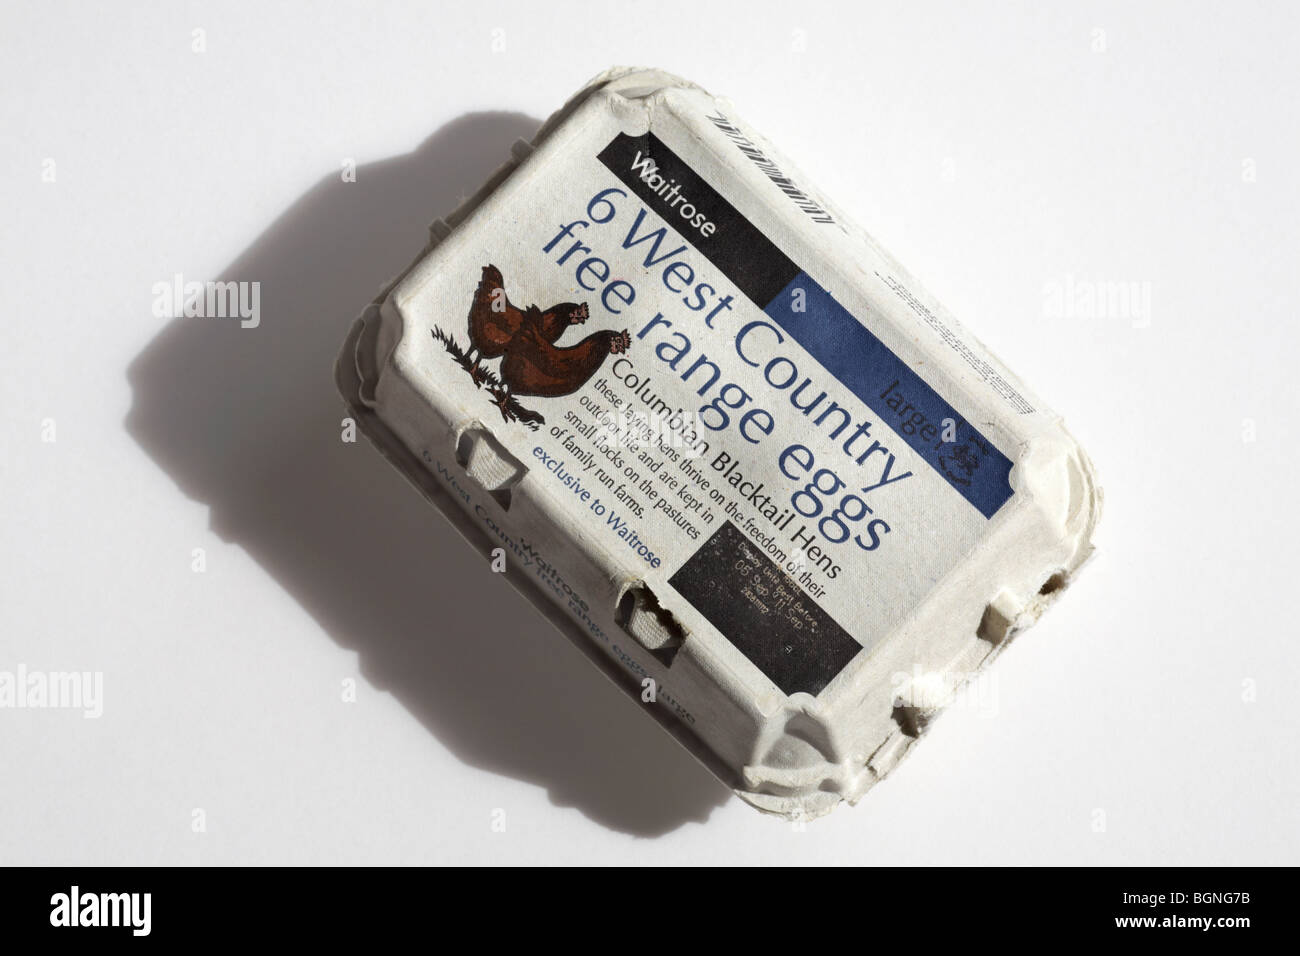 Egg box closed - Waitrose 6 West Country free range eggs Columbian Blacktail Hens isolated on white background  - Stock Image